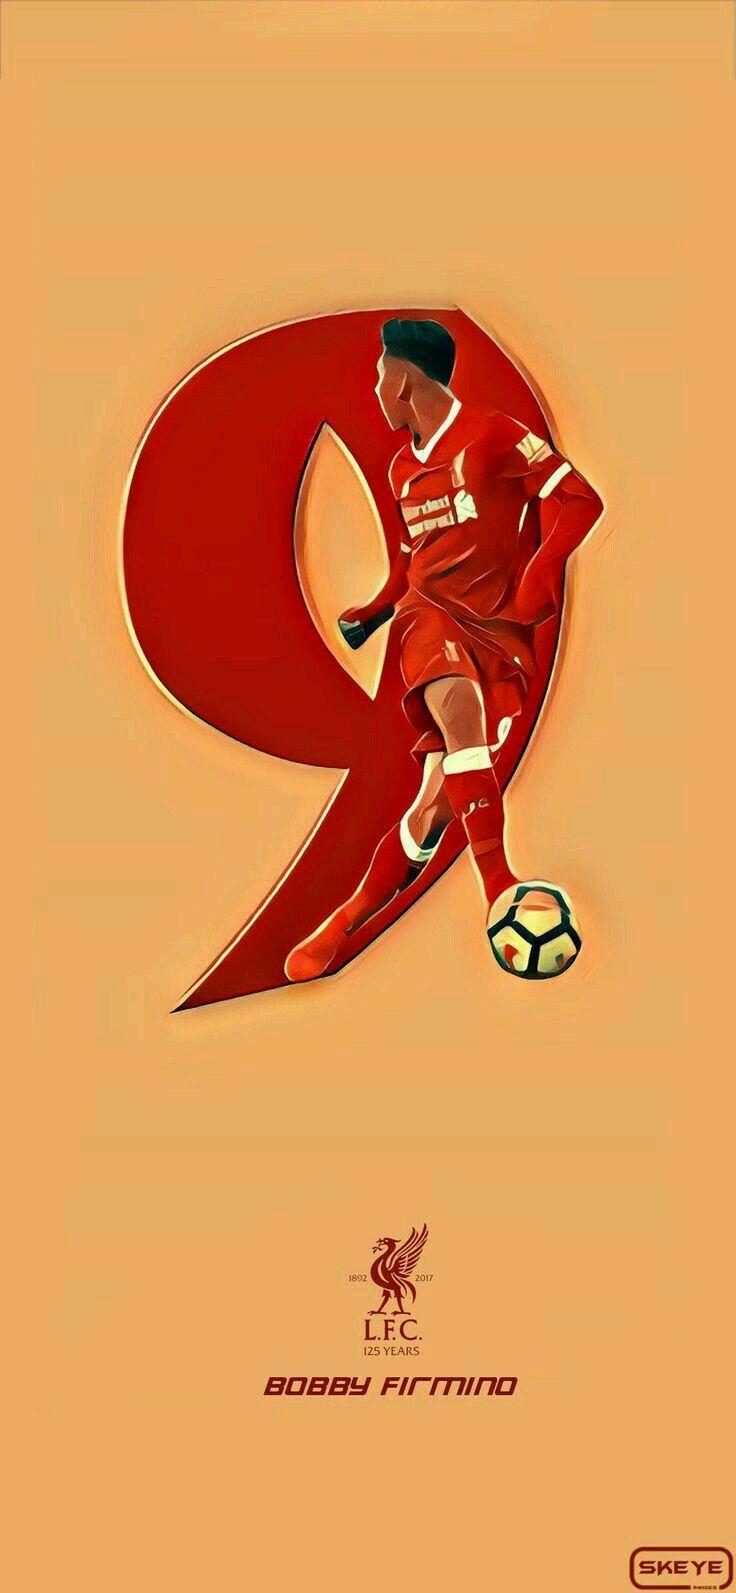 No Look Firmino Liverpool Futebol Bor U00fassia Dortmund